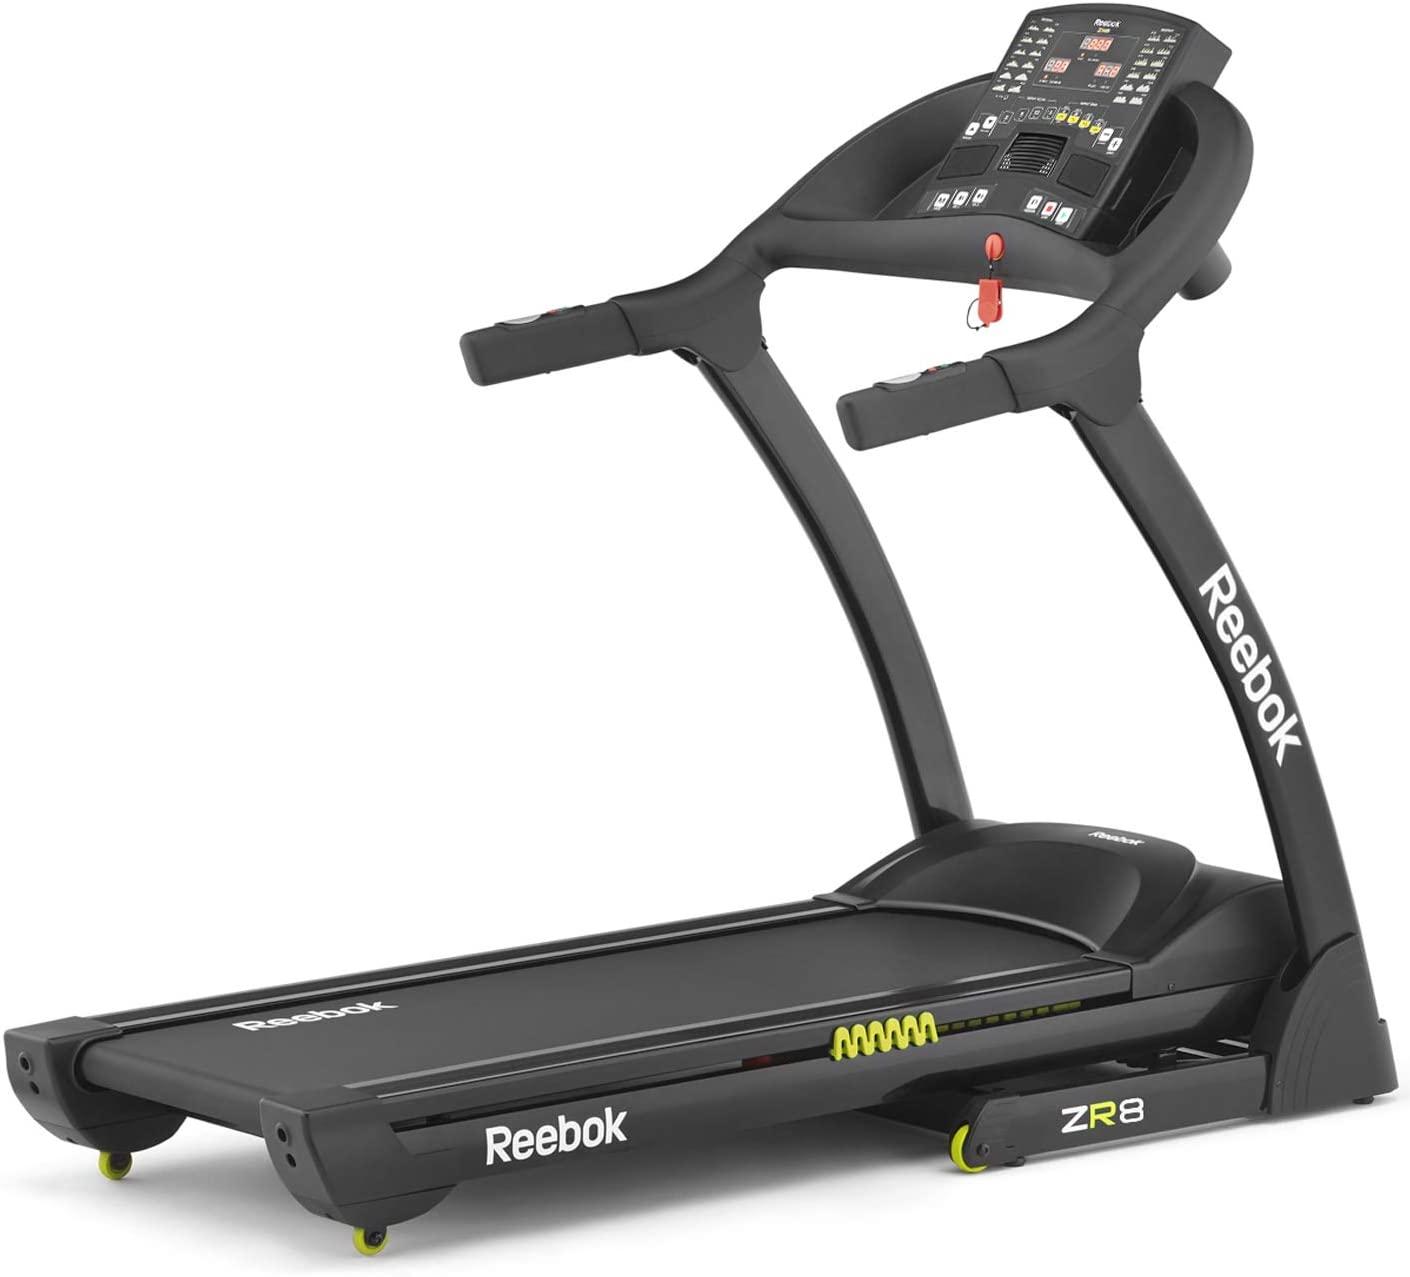 Reebok ZR8 Treadmill Amazon - £449